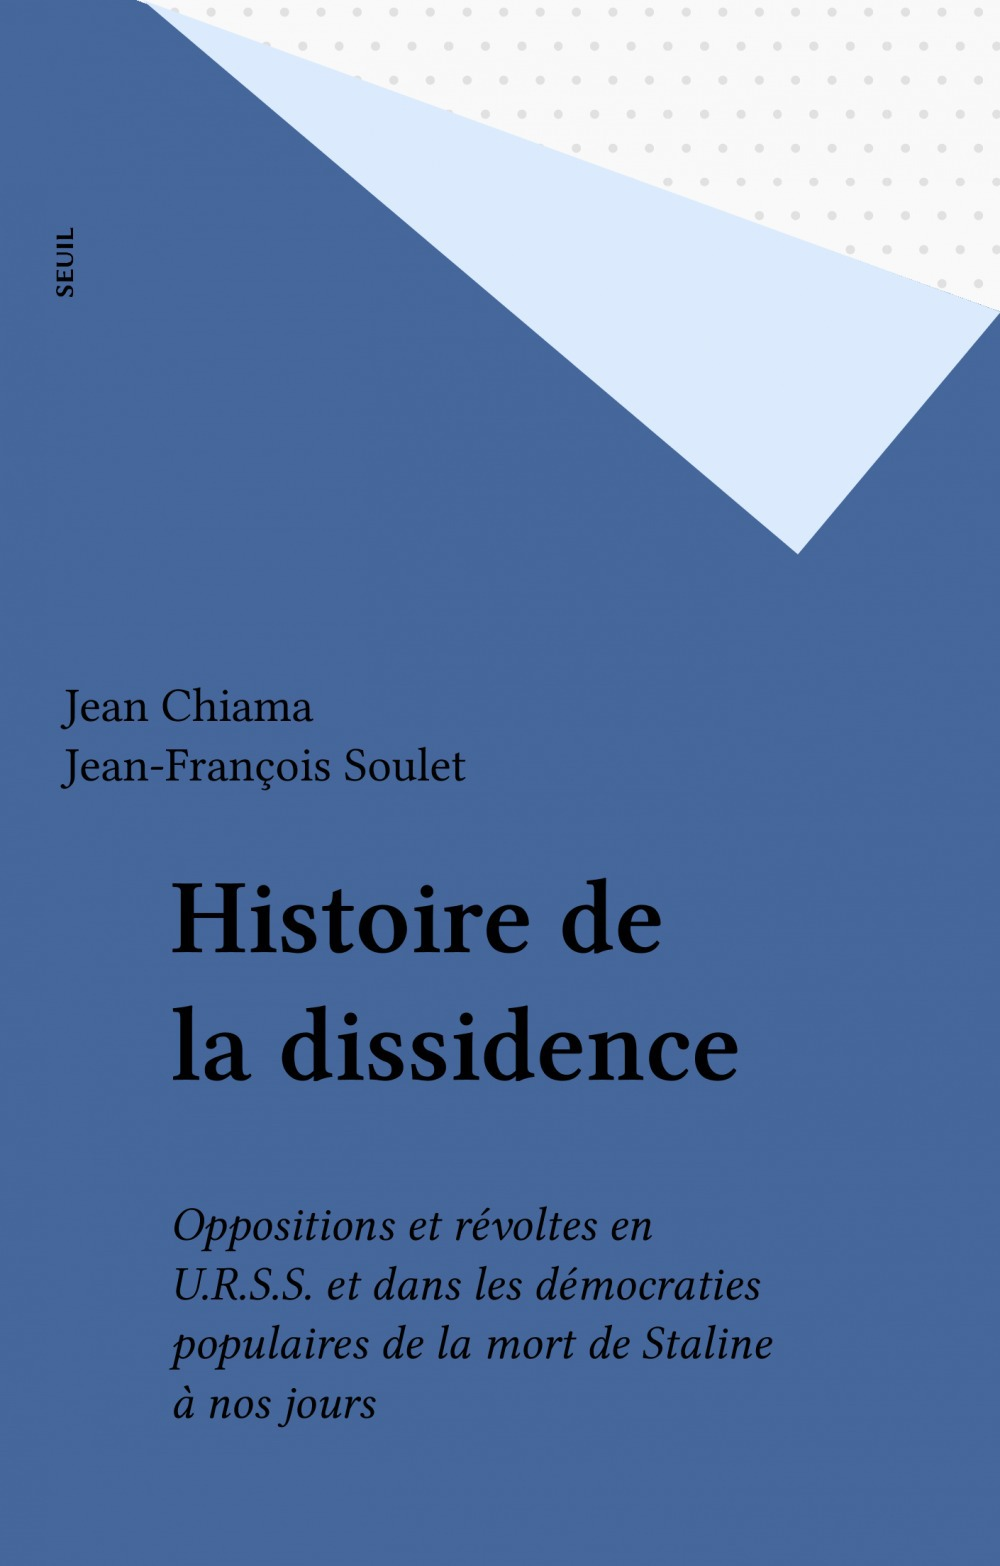 Histoire de la dissidence  - Jean-François Soulet  - Jean Chiama